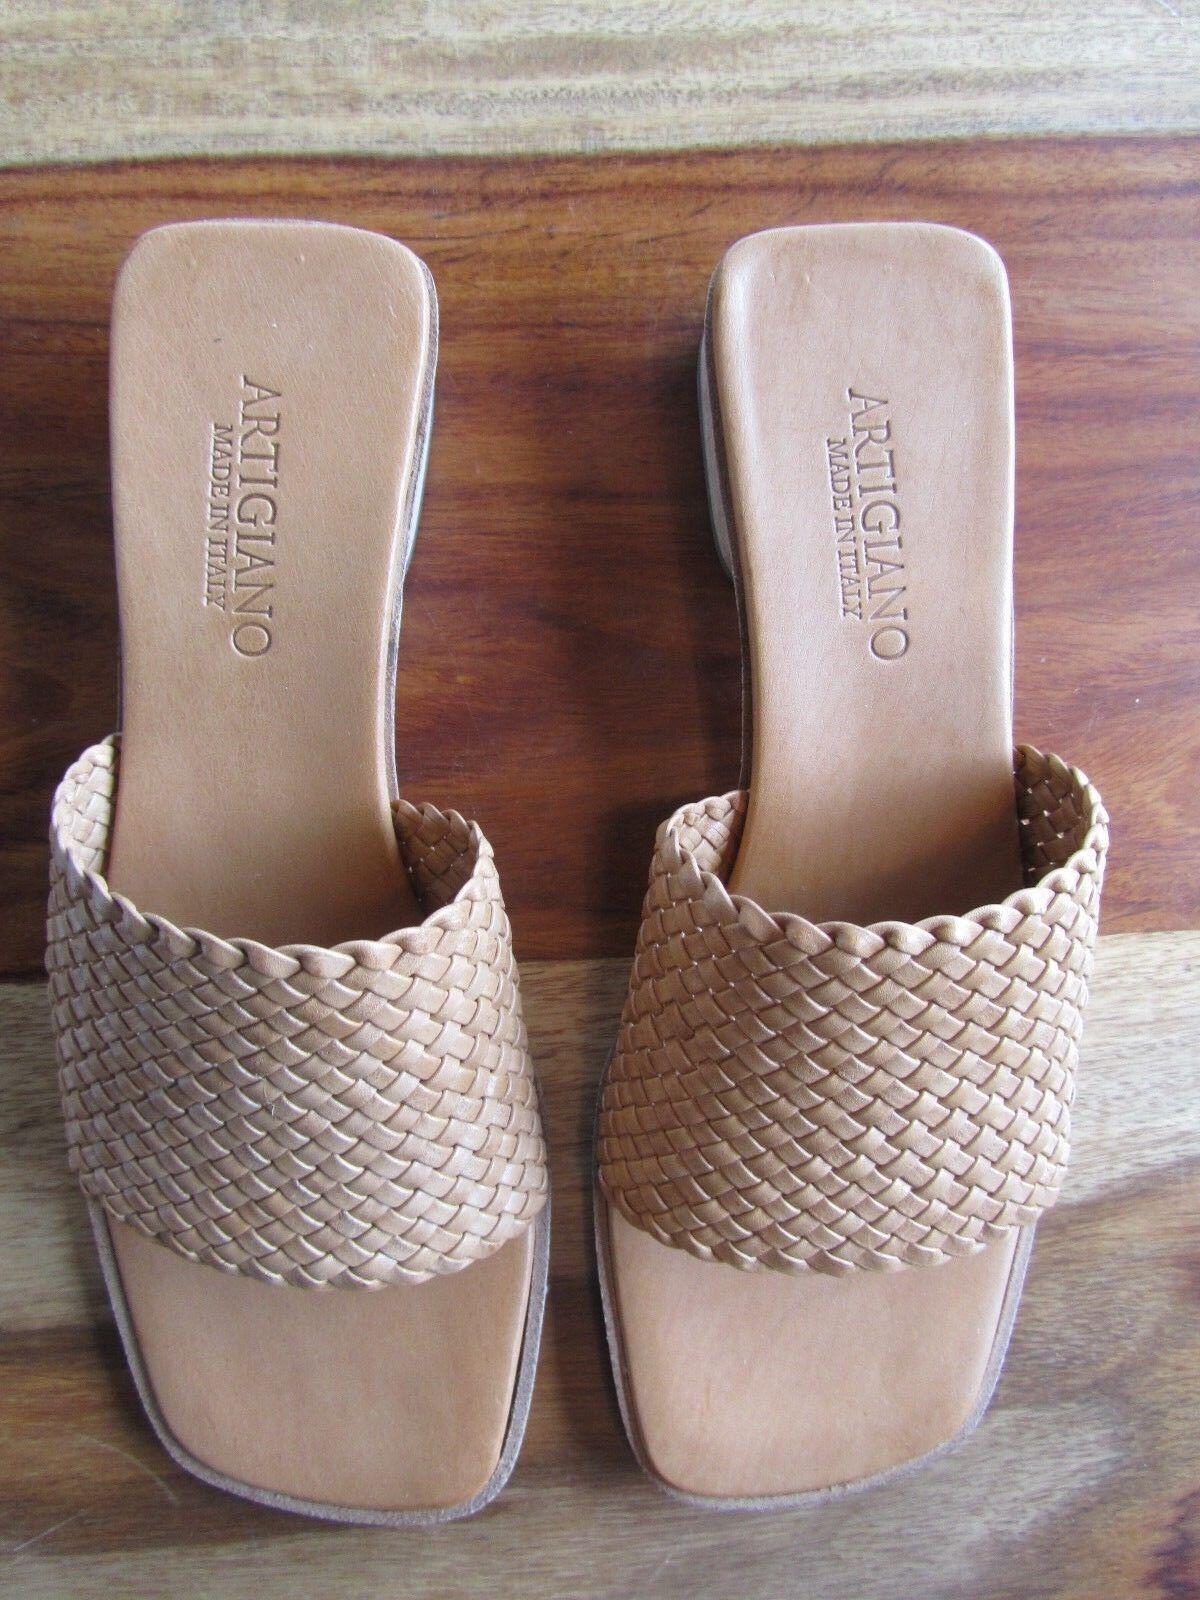 GORGEOUS ARTIGIANO SIZE Schuhe/SANDALS MADE IN ITALY SIZE ARTIGIANO 37 NATURAL 15mm HEEL 832392